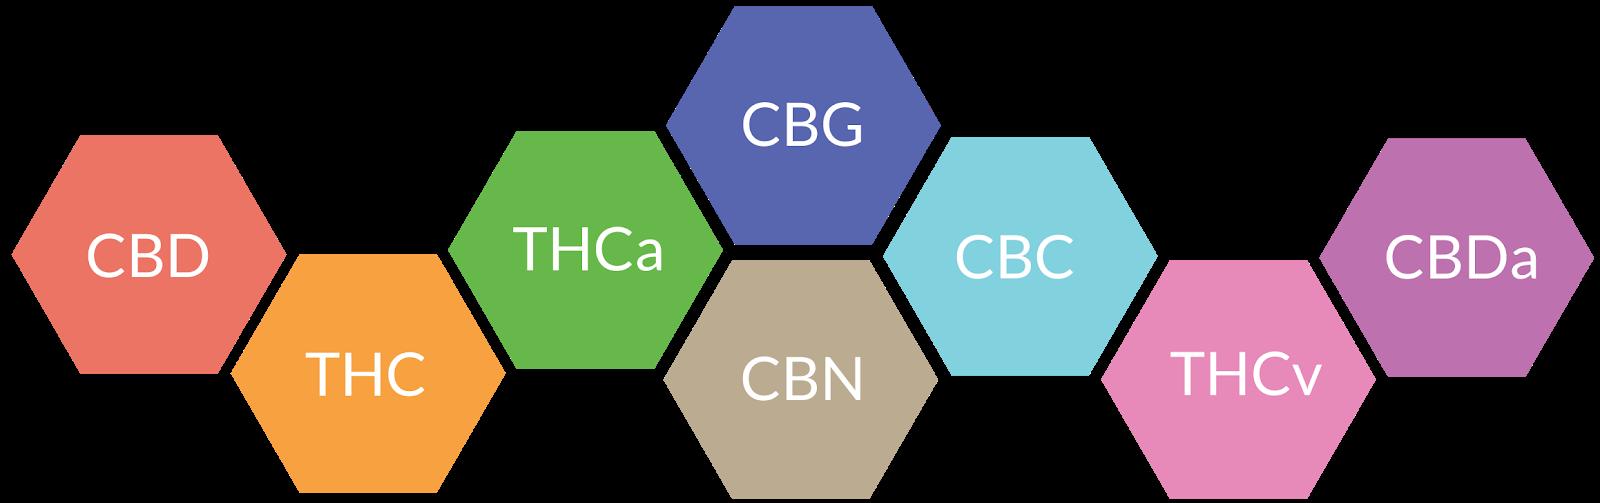 cannabinoid chain